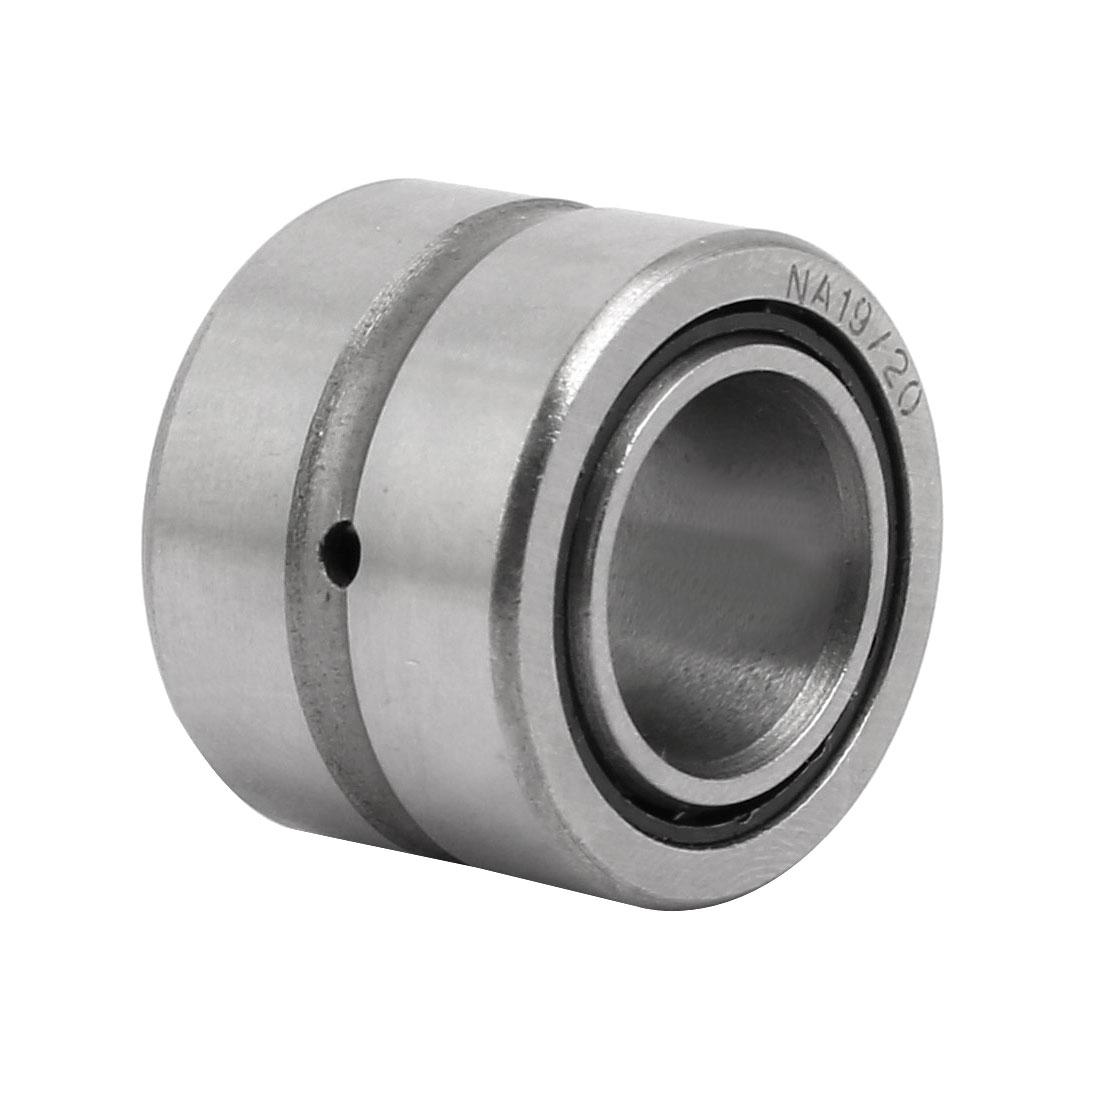 NKI15/20 15mmx27mmx20mm Inner Ring Needle Roller Bearing Silver Tone